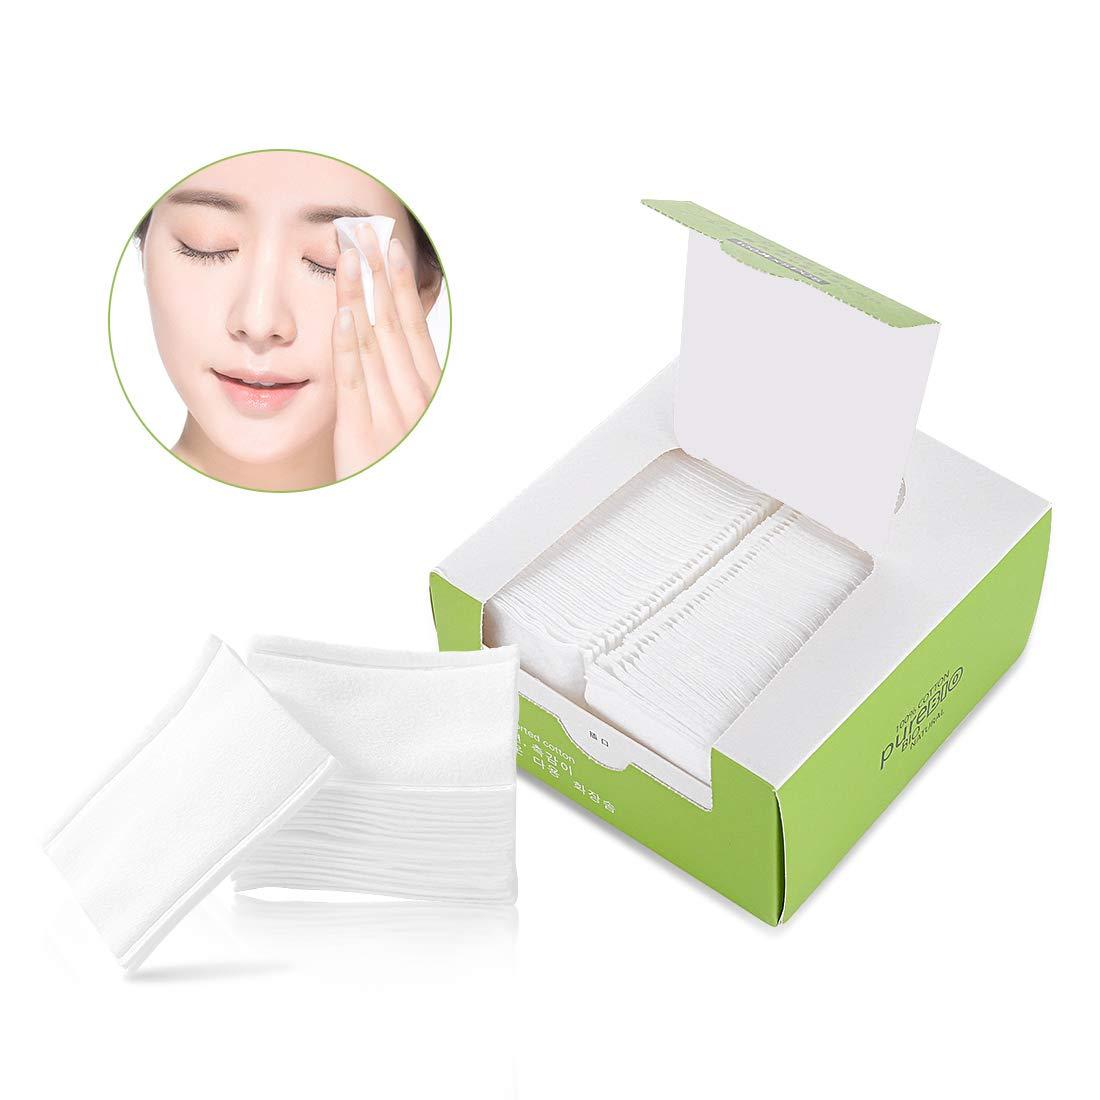 100x5PCS 100% Natural OrganicCotton Pads Makeup Facial pads Soft Cotton Pads Make Up Removing 60x50 mm